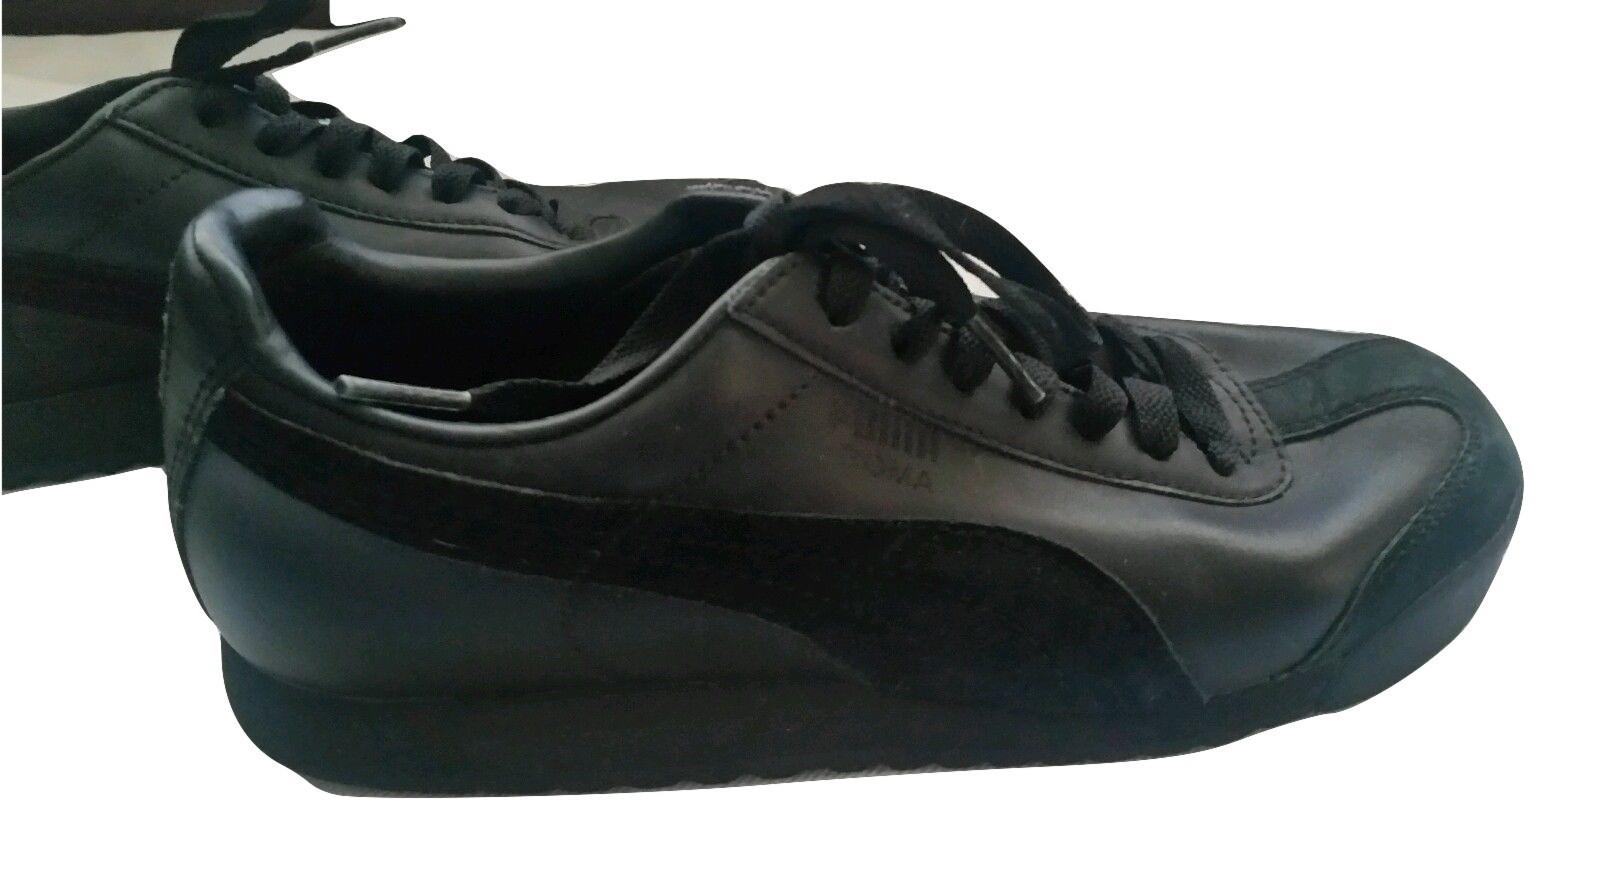 Img 4311639949 1501420068. Img 4311639949 1501420068. Puma Roma Basic  Women s Black leather sneakers Sz 5 US ... 034eaf8ce